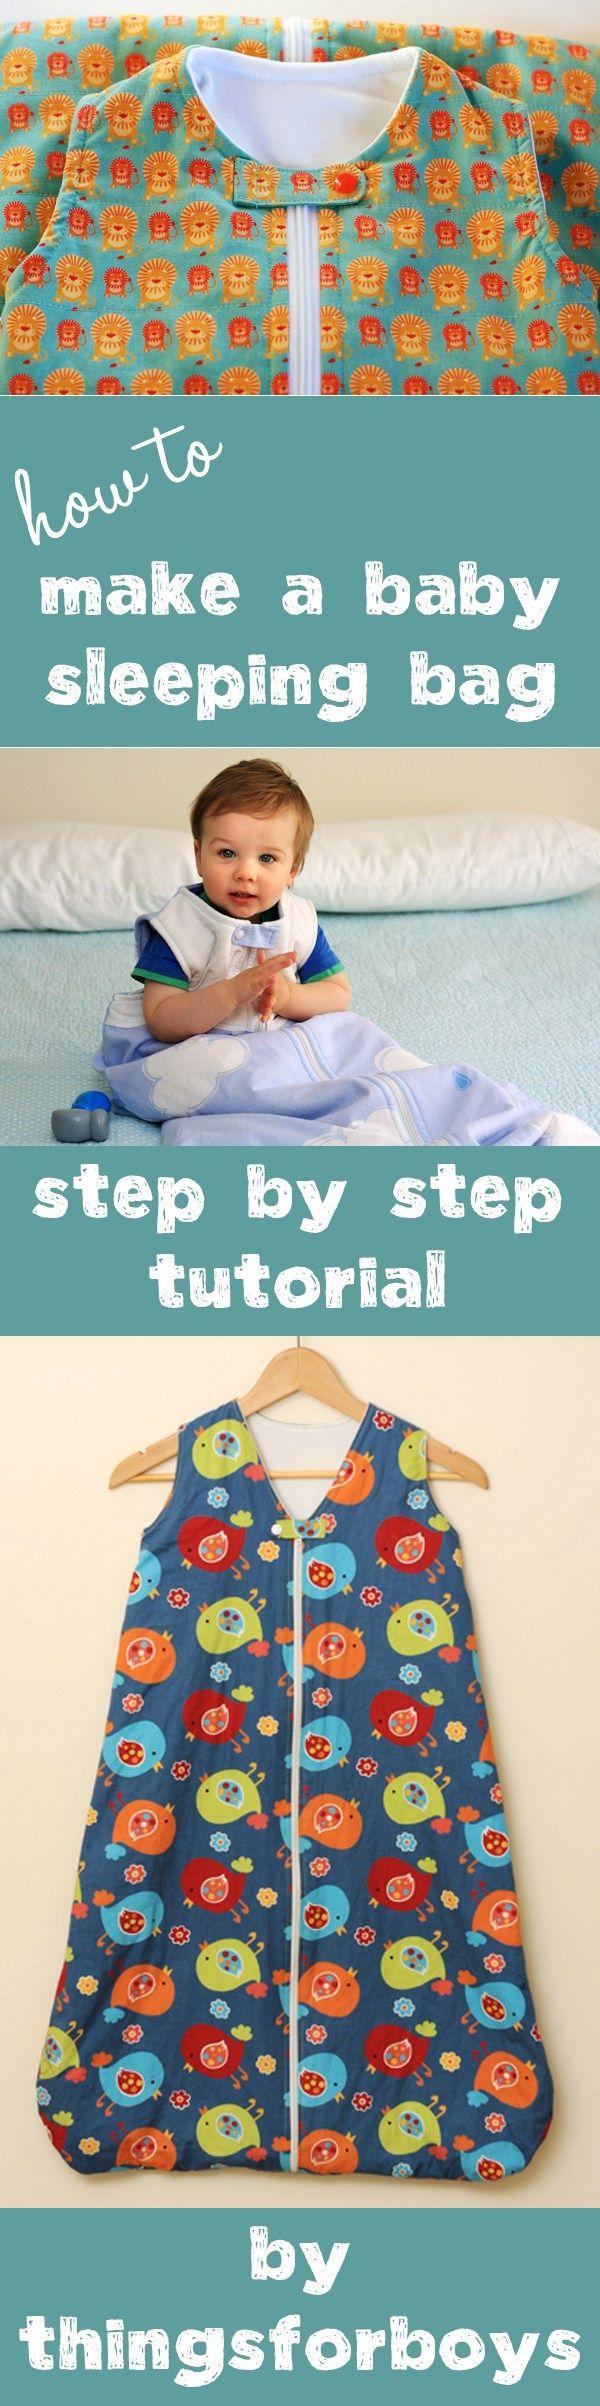 How to make a baby sleep sack - step by step tutorial